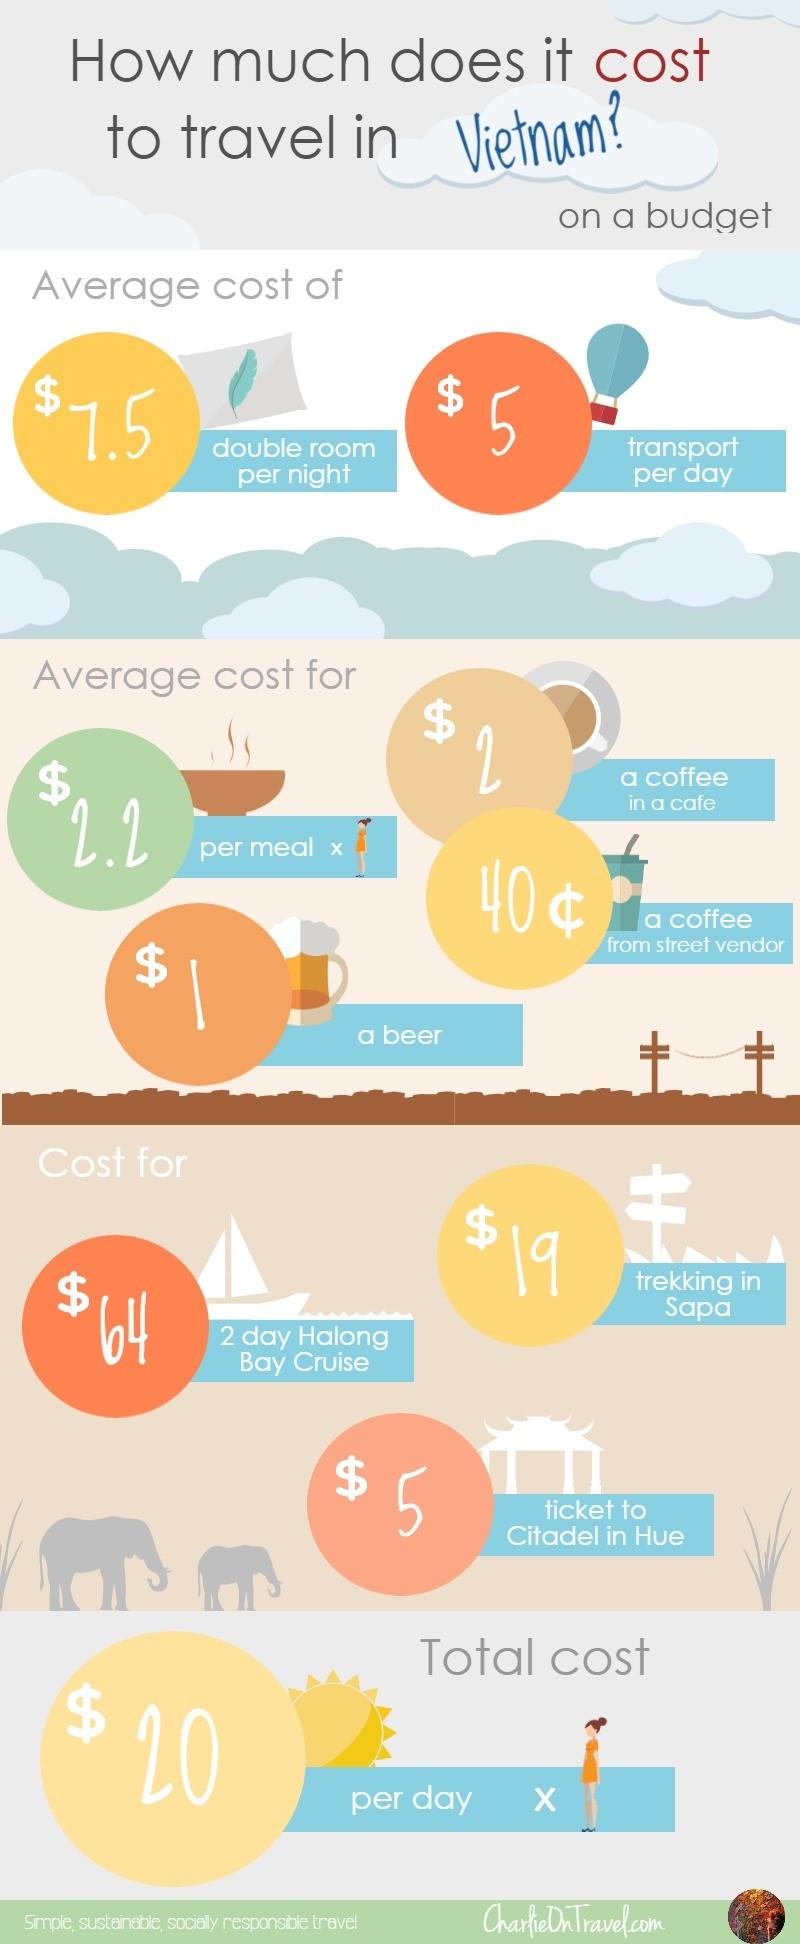 How Much A Trip to Vietnam Costs | Vietnam Travel Budget 2017